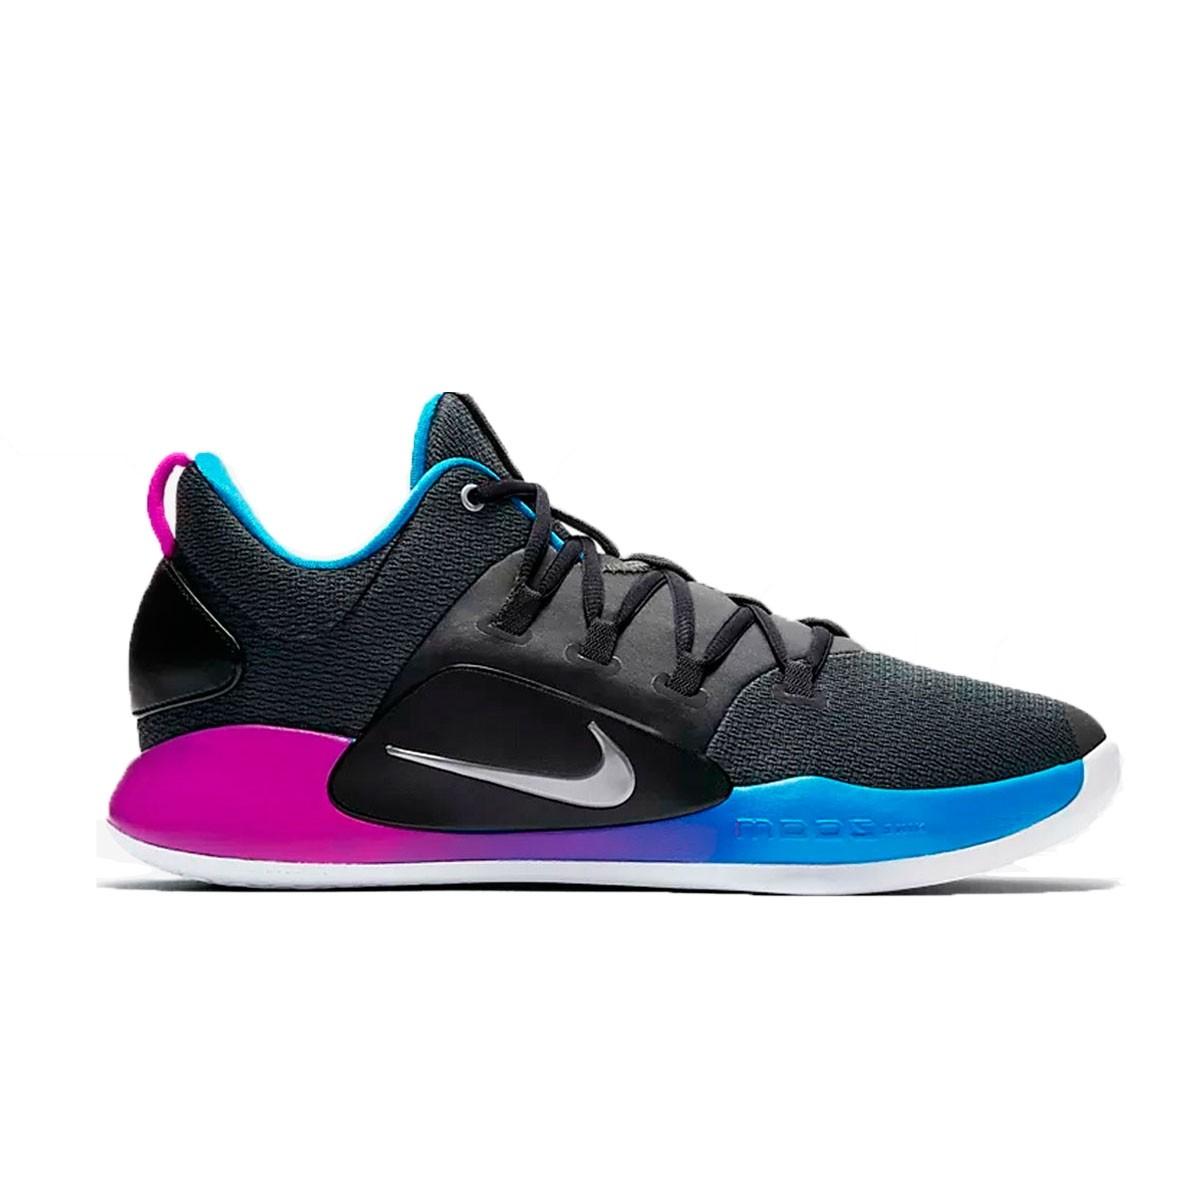 Nike Hyperdunk X Low 2018 'Huarache'